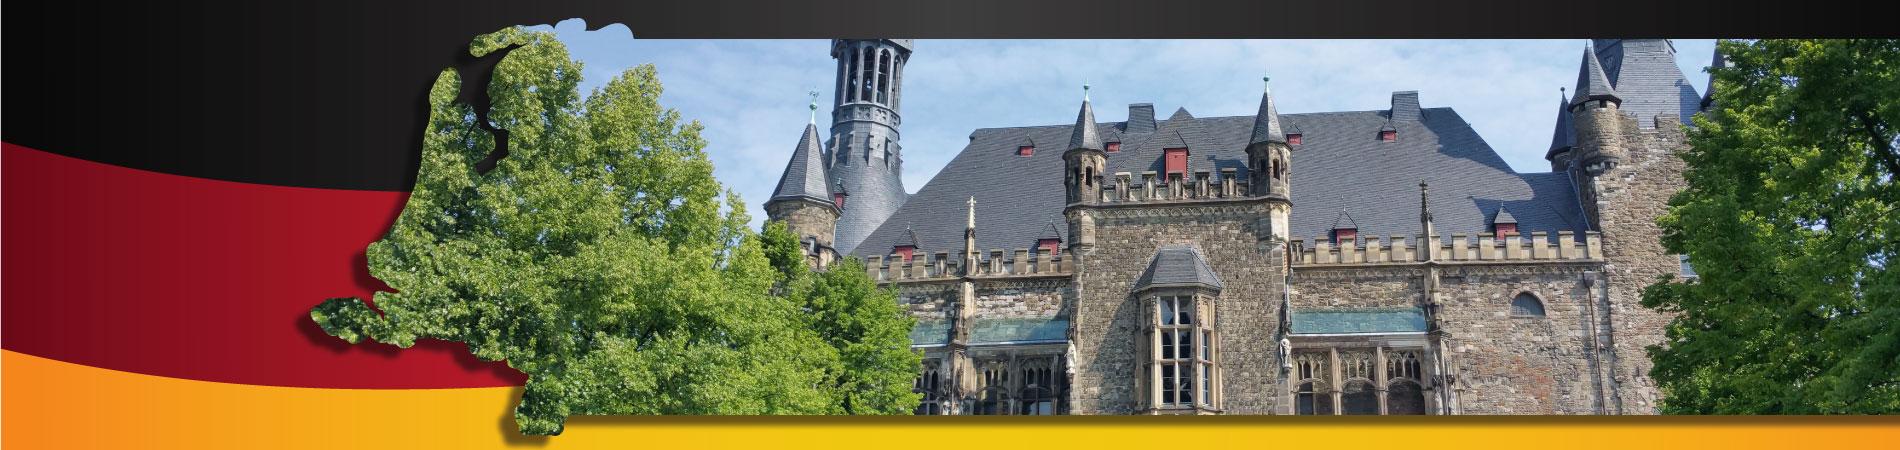 Rathaus tour